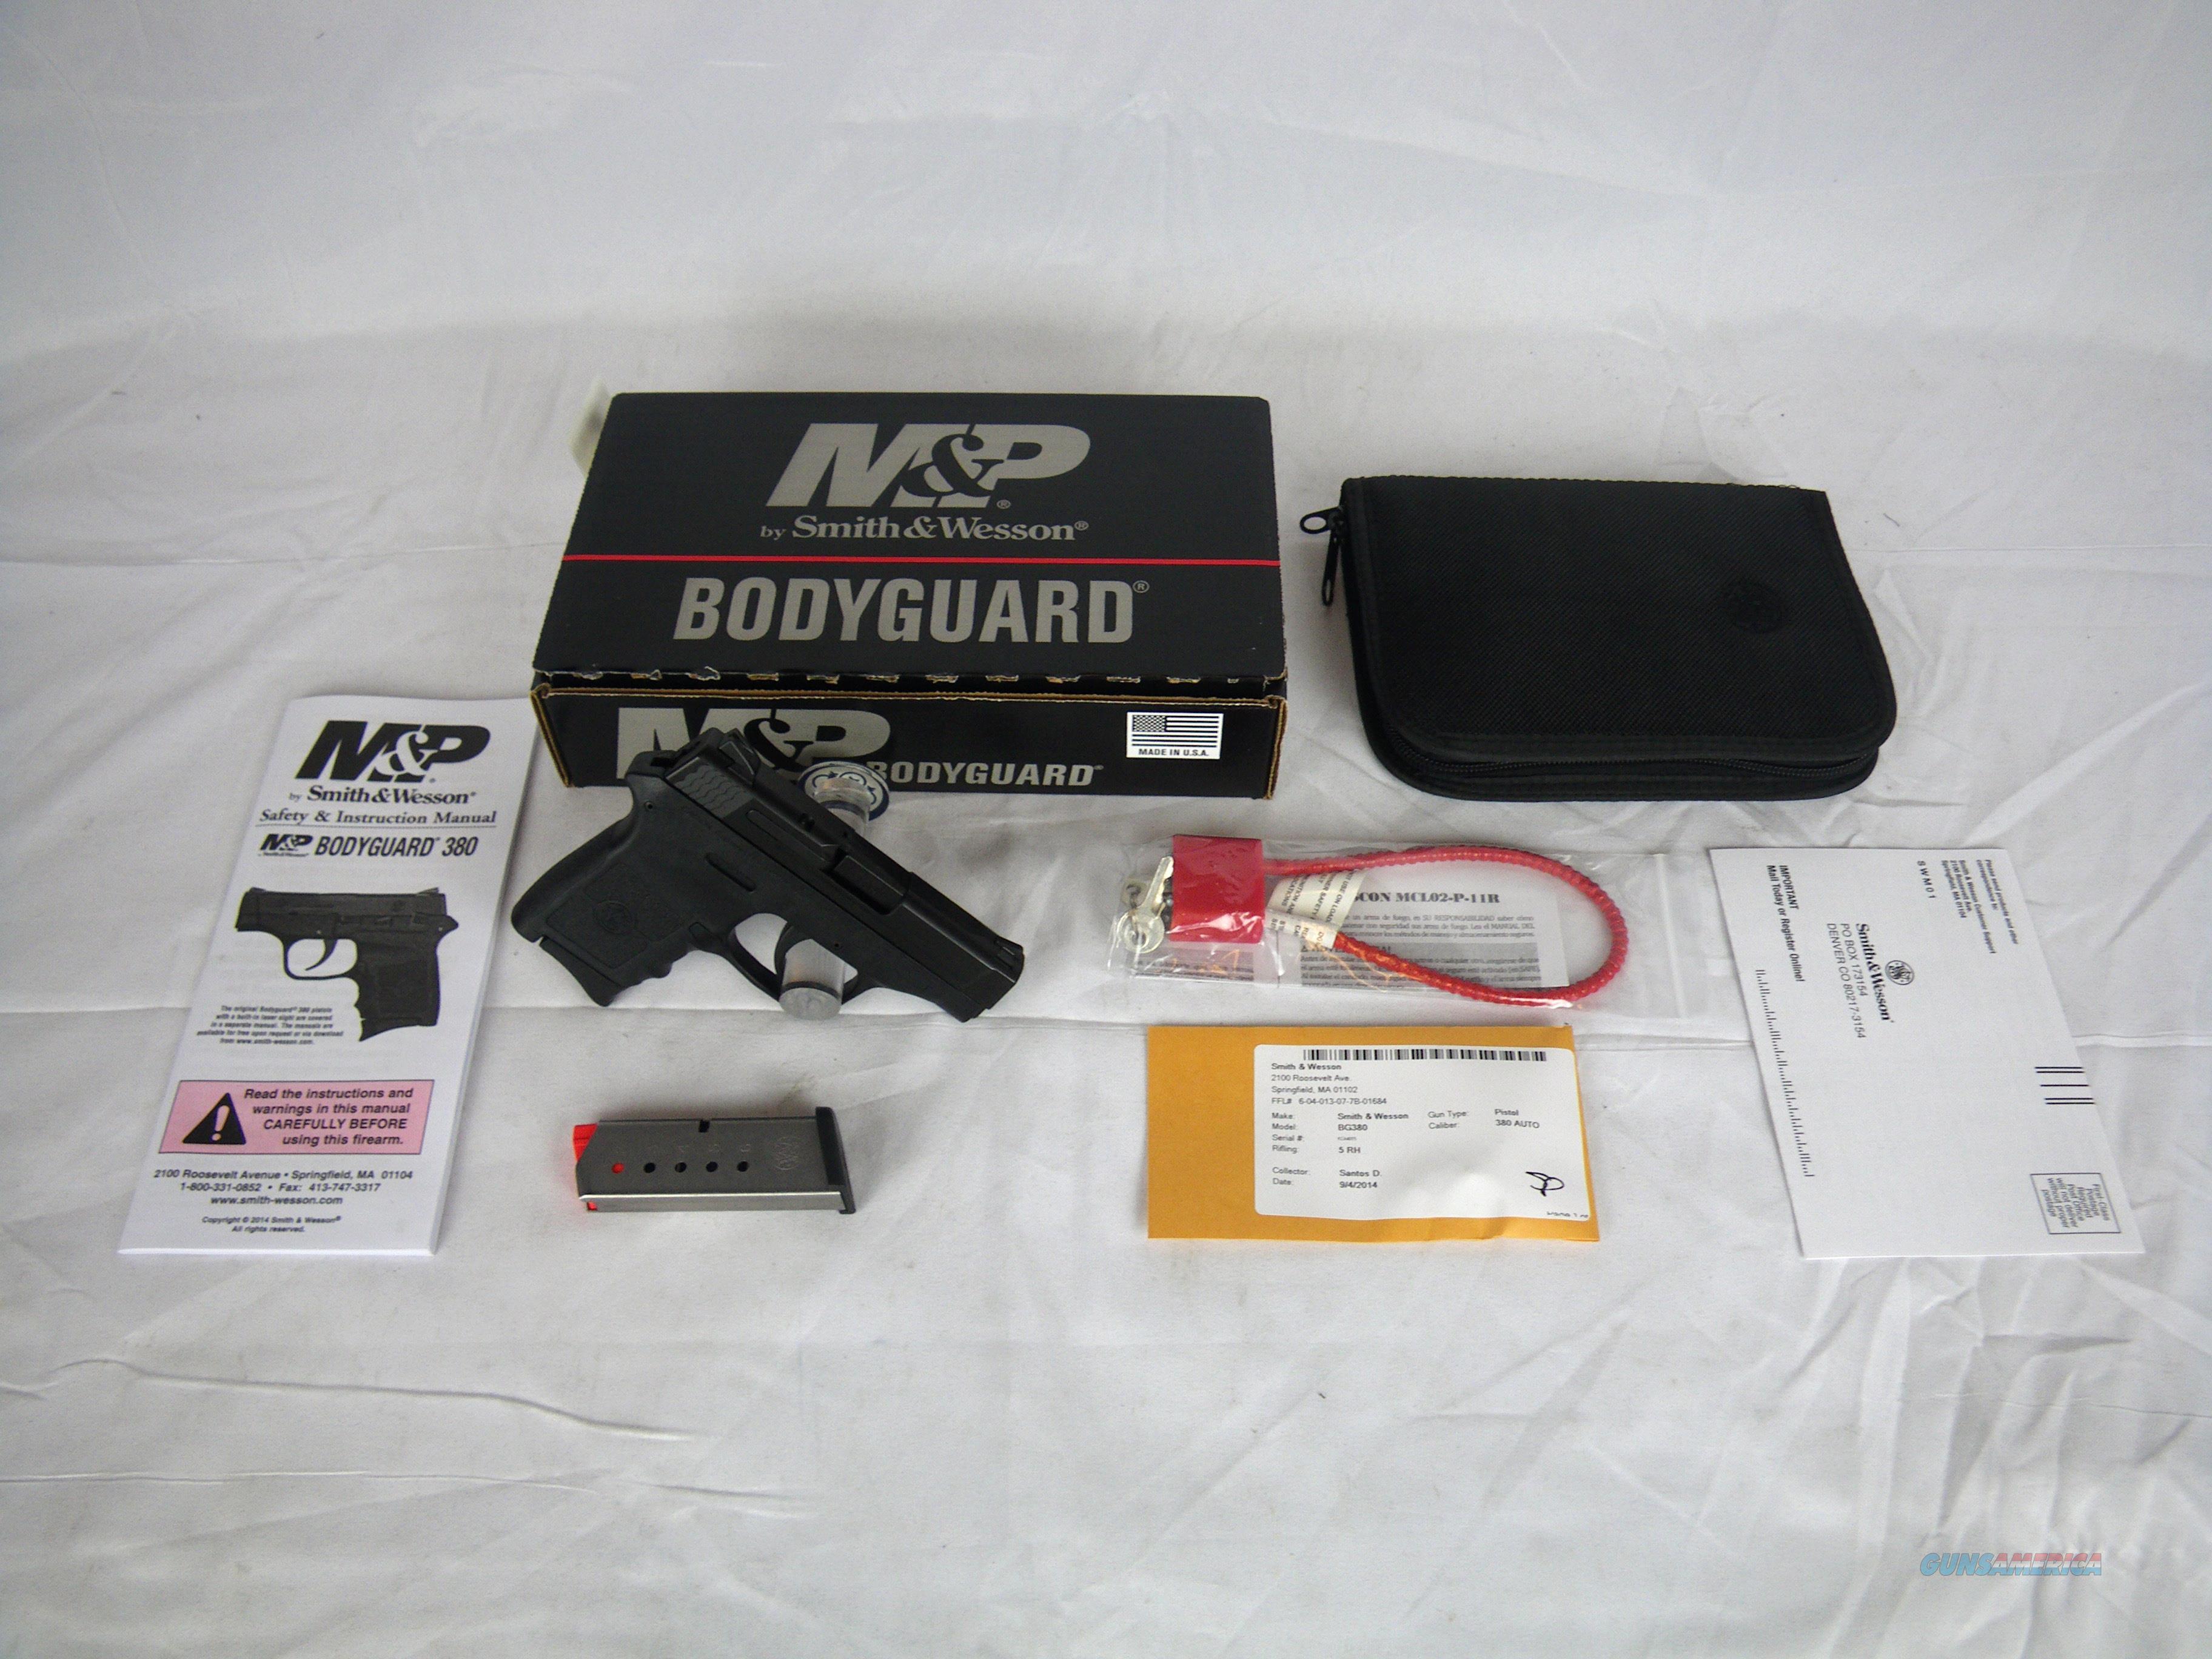 "Smith & Wesson M&P Bodyguard 380 ACP 2.75"" S&W NEW #109381  Guns > Pistols > Smith & Wesson Pistols - Autos > Polymer Frame"